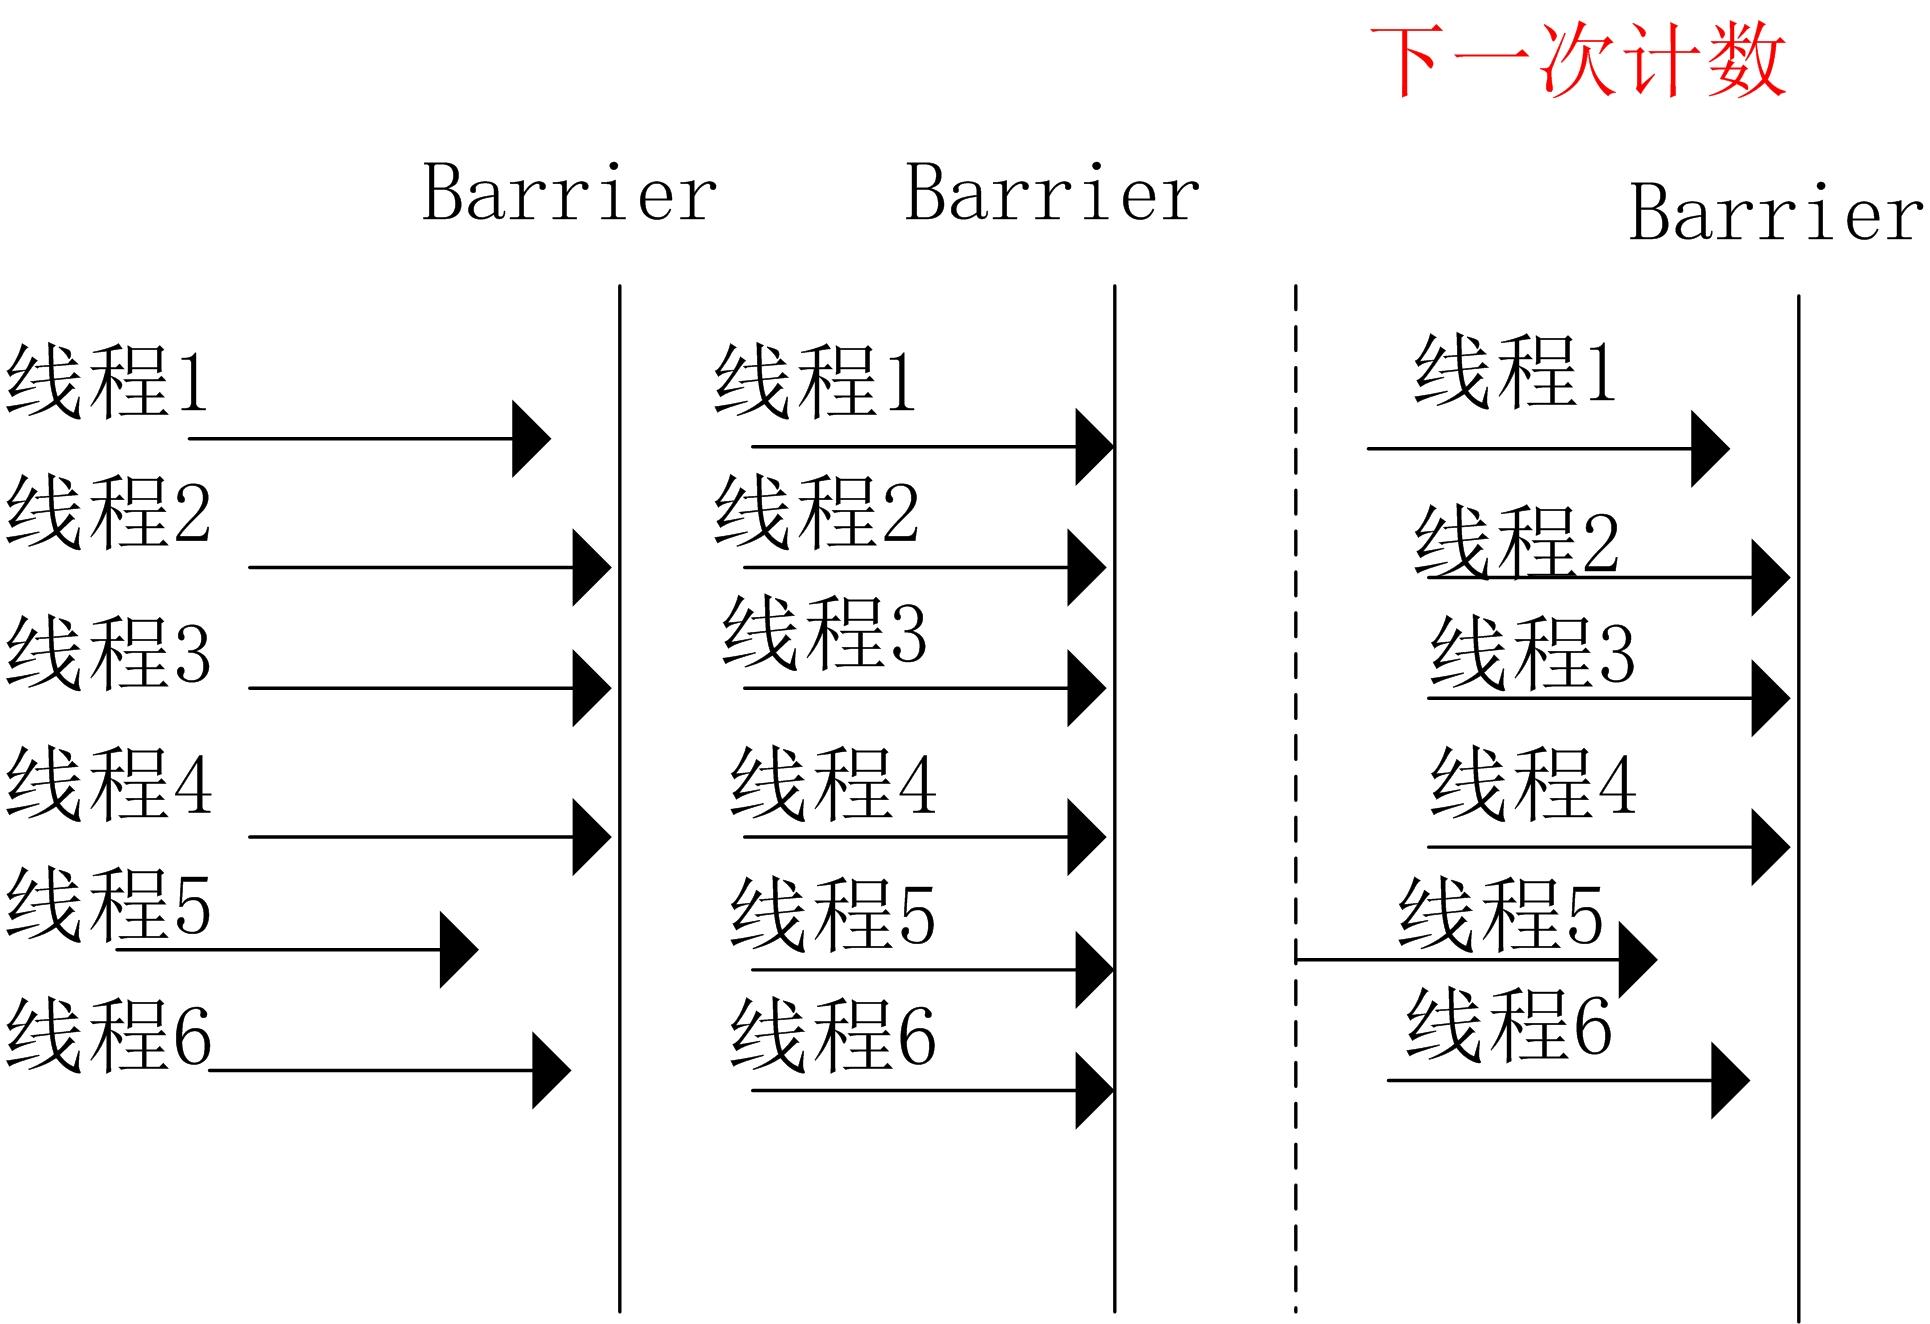 CyclicBarrier执行示意图.jpg